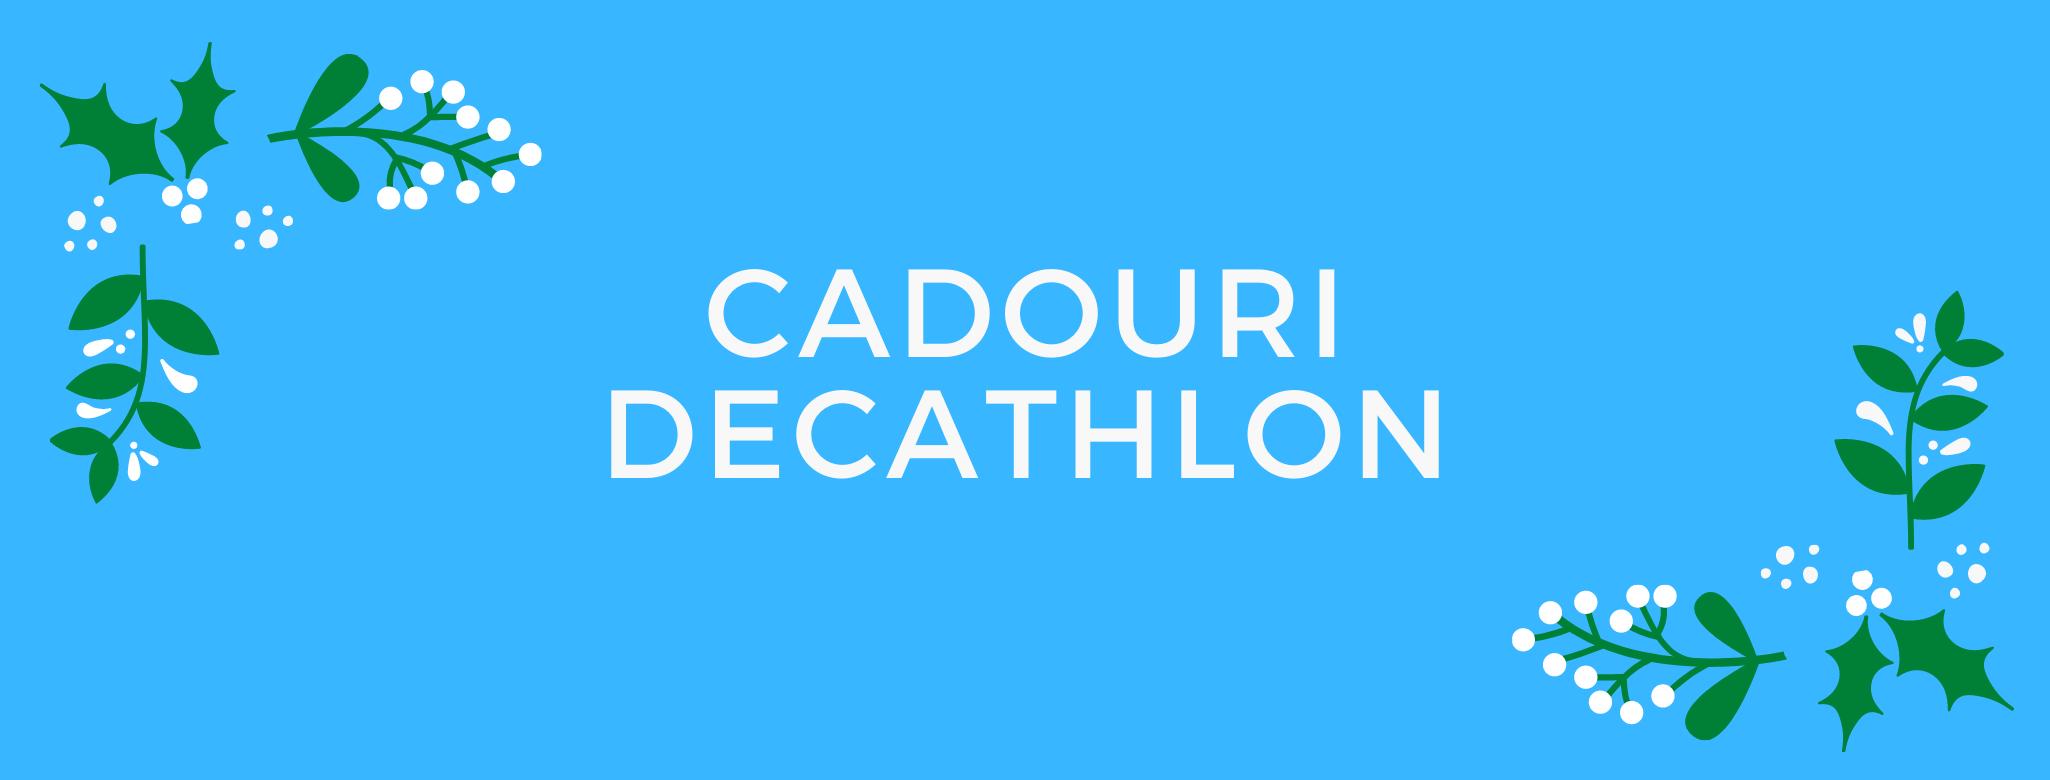 Cadouri utile din portofoliul Decathlon